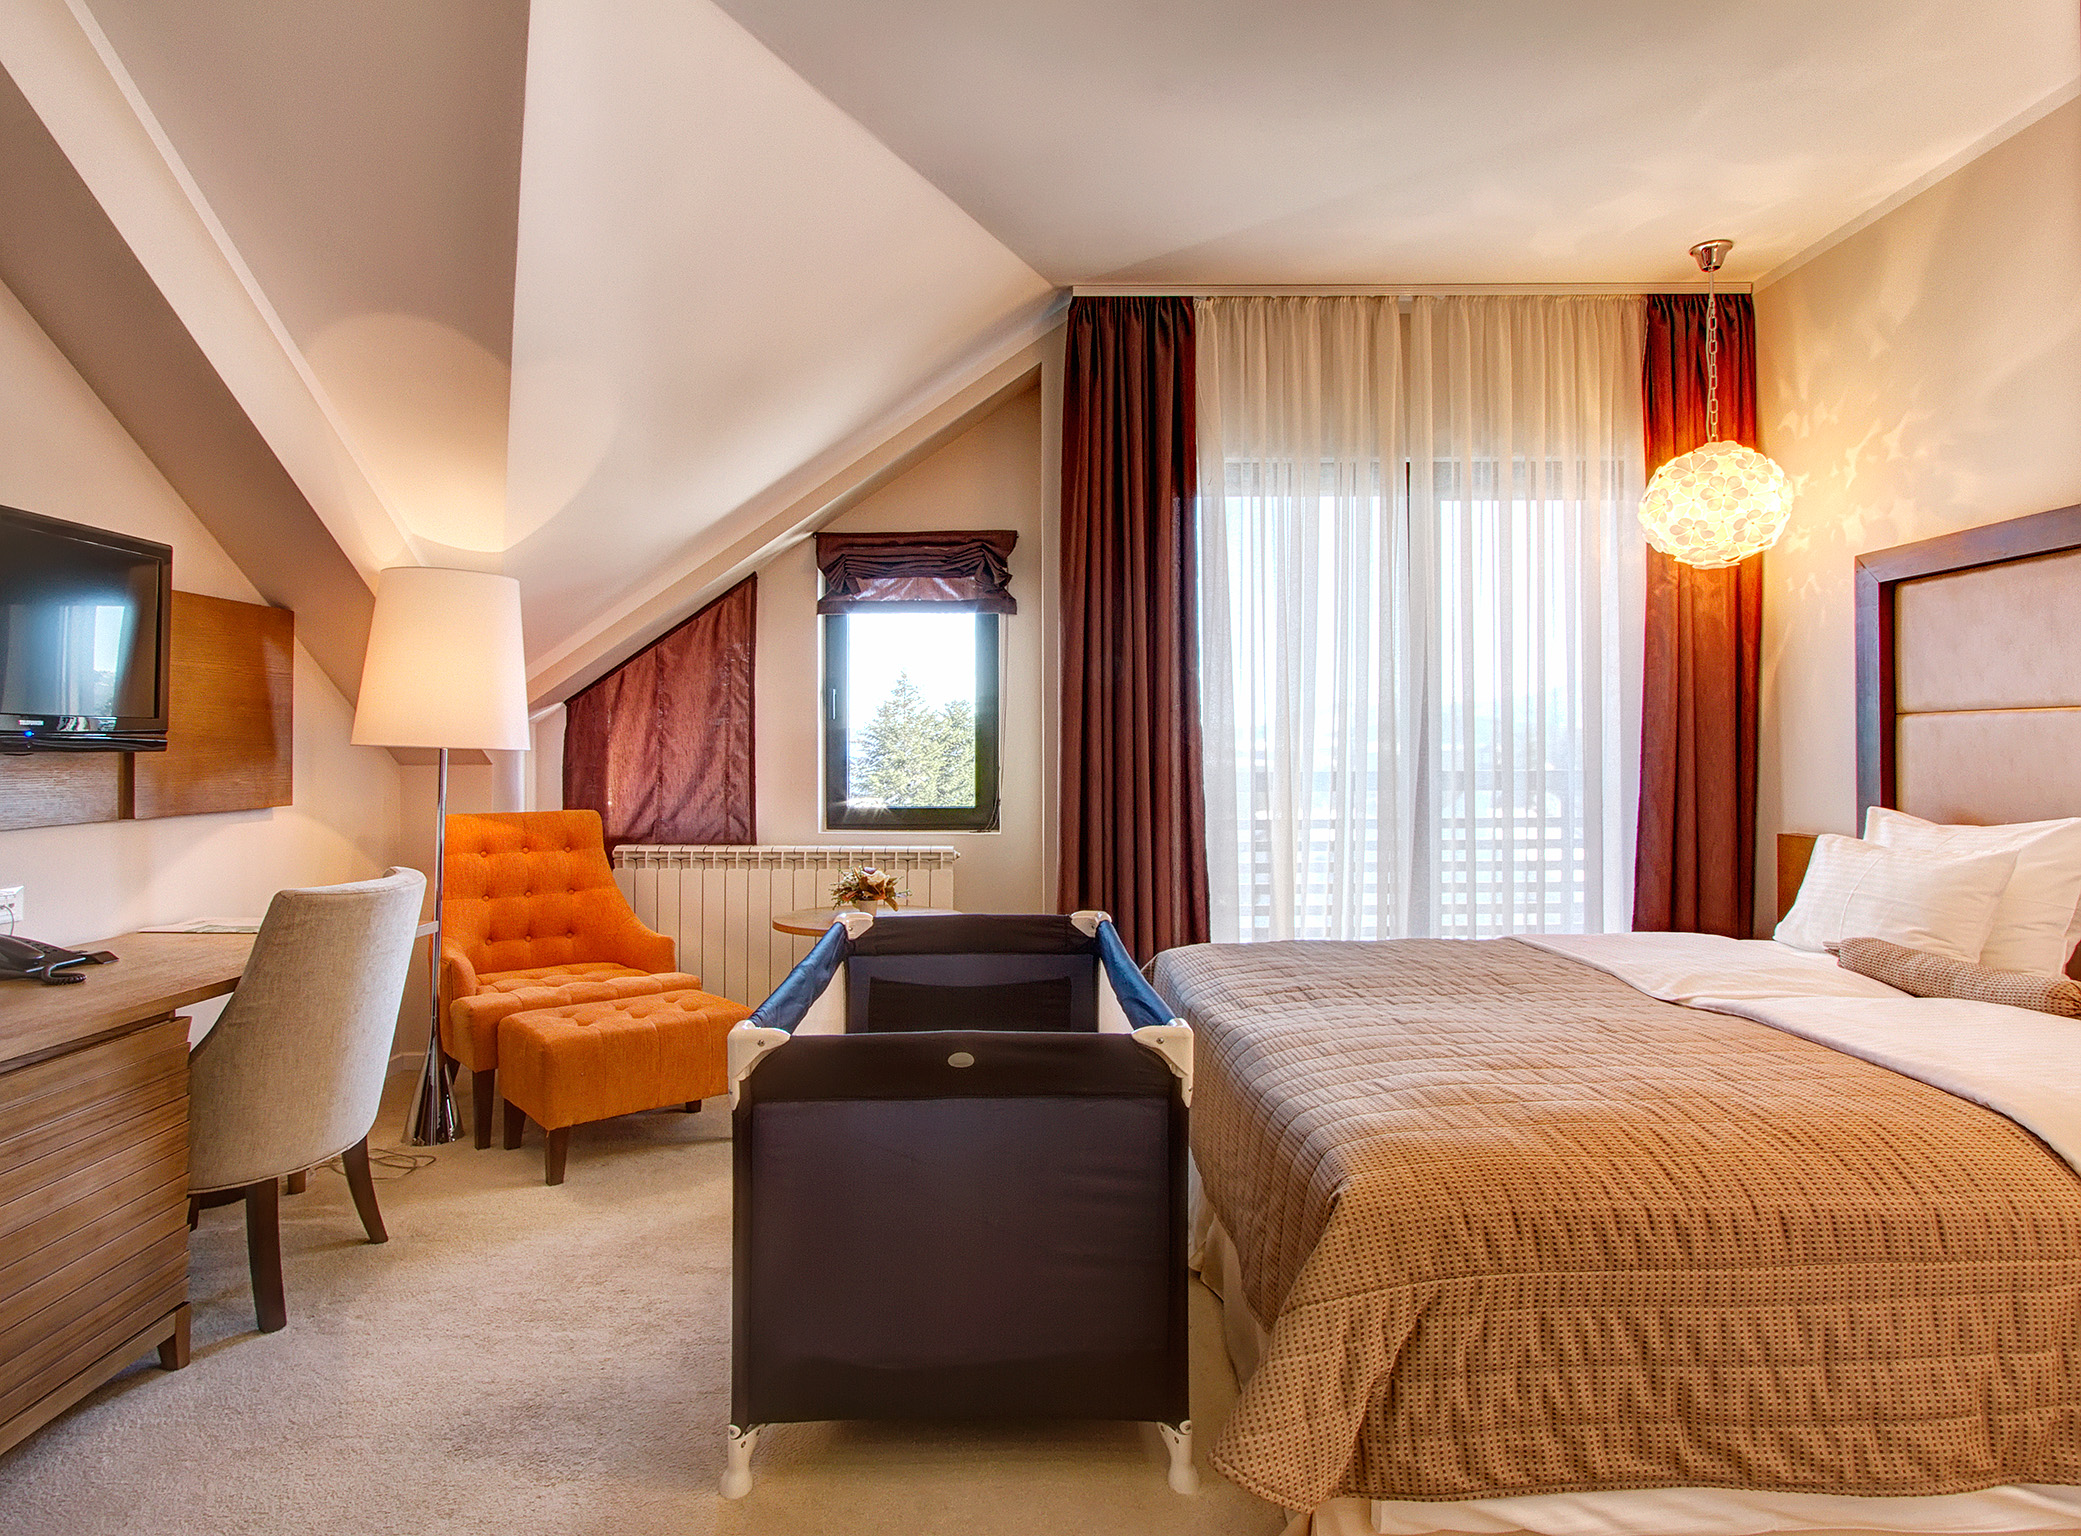 Zlatibor, smestaj, letnji odmor, spavanje, pansion, spa, soba, apartman, akcija, nova godina, hotel mir 16